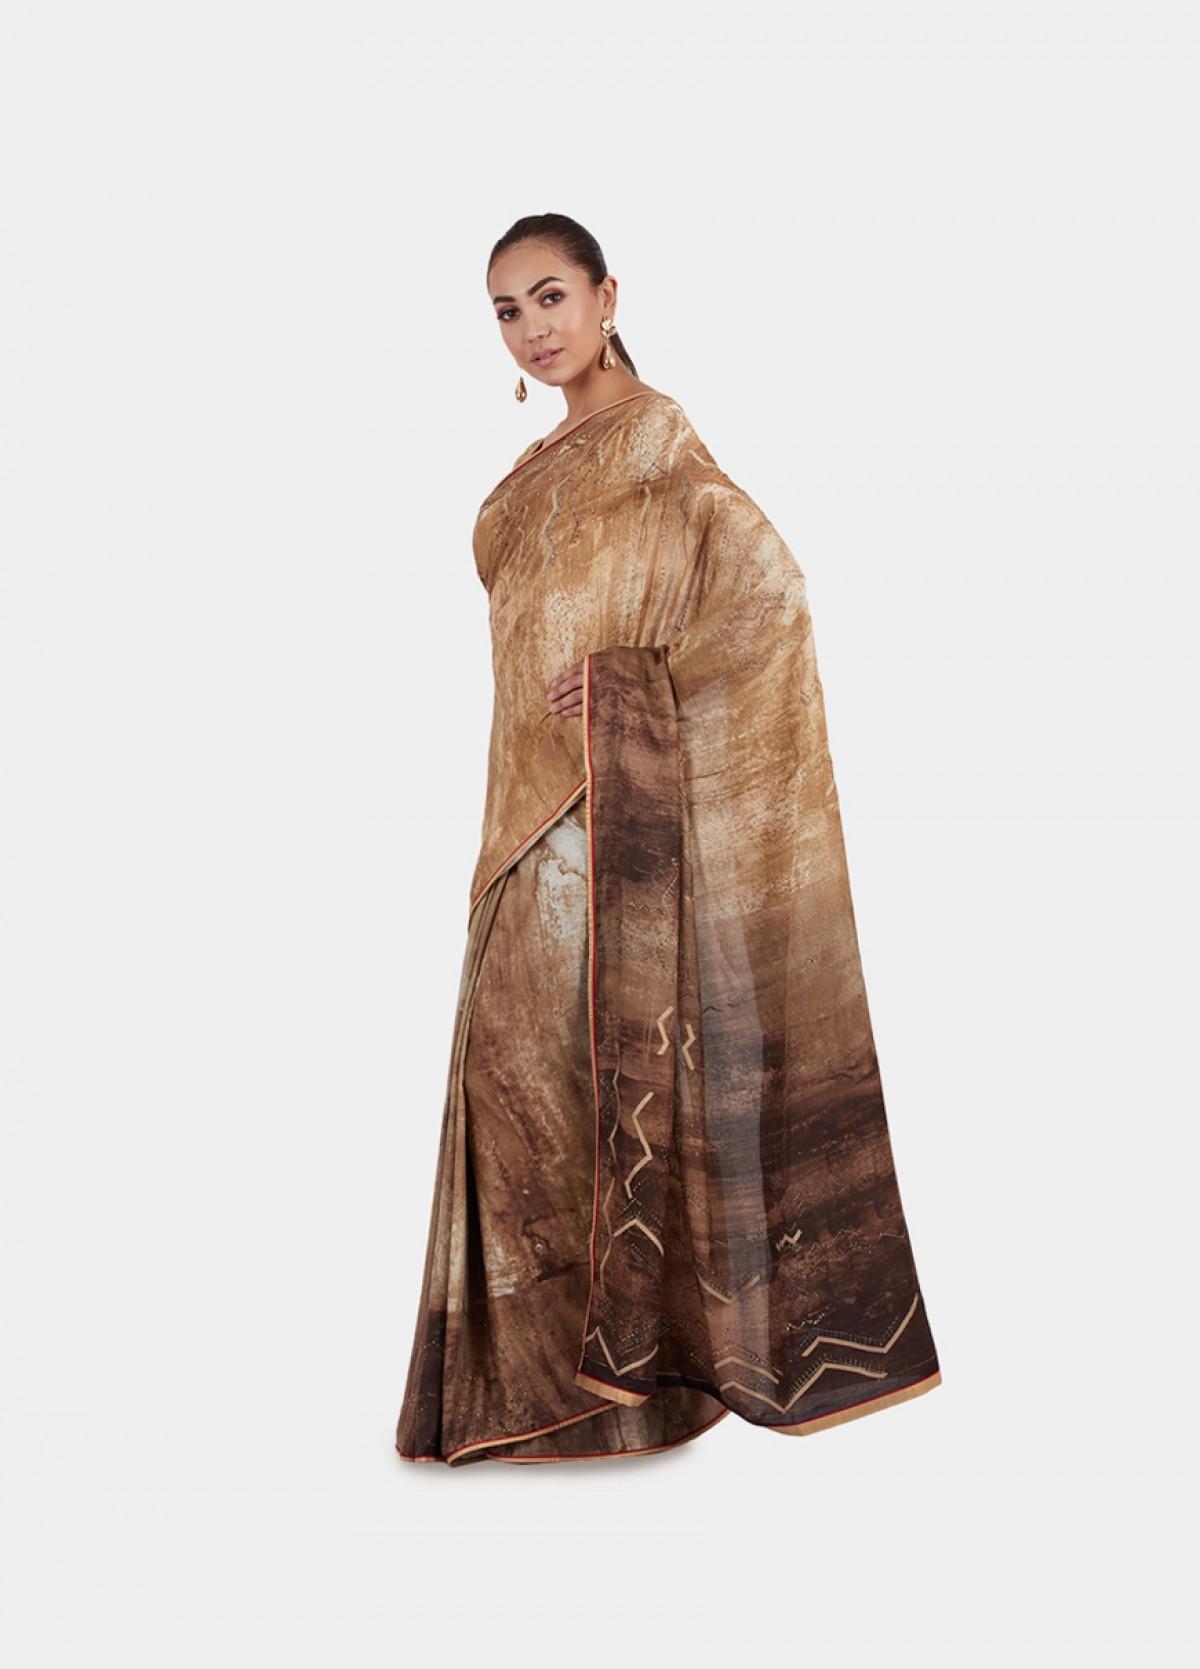 The Geometric Haze Sari